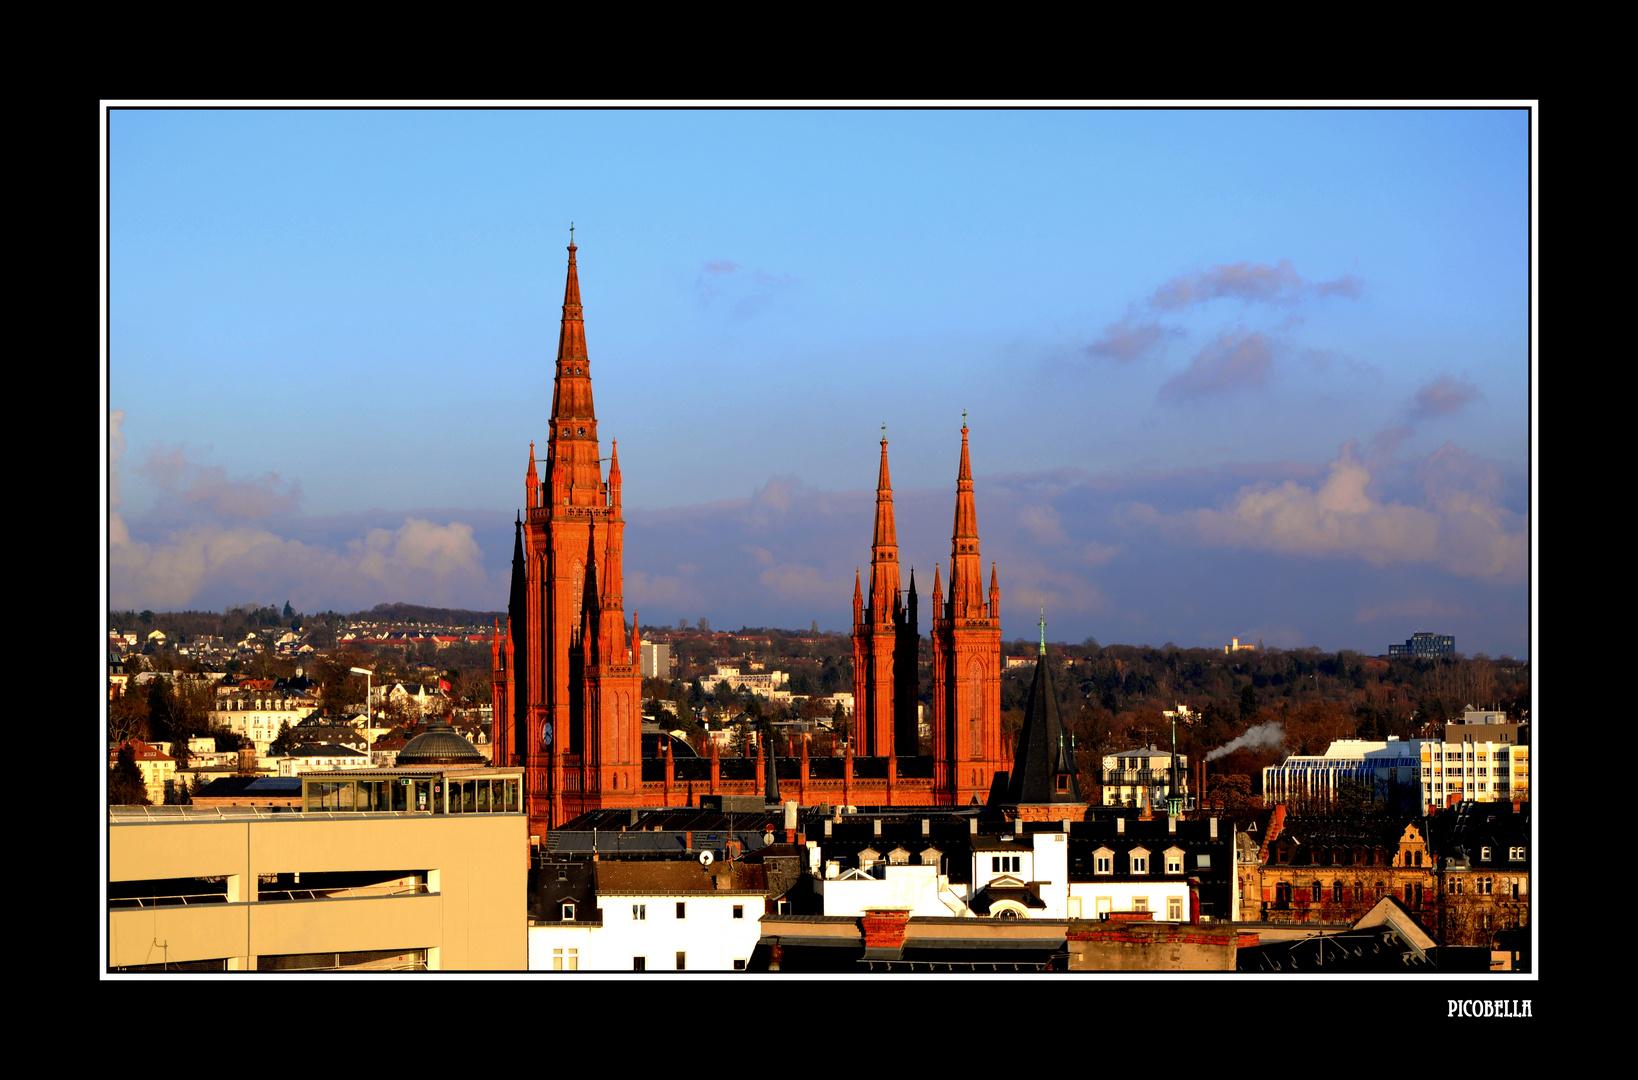 Marktkirche Wiesbaden Heute In Der Abendsonne Foto